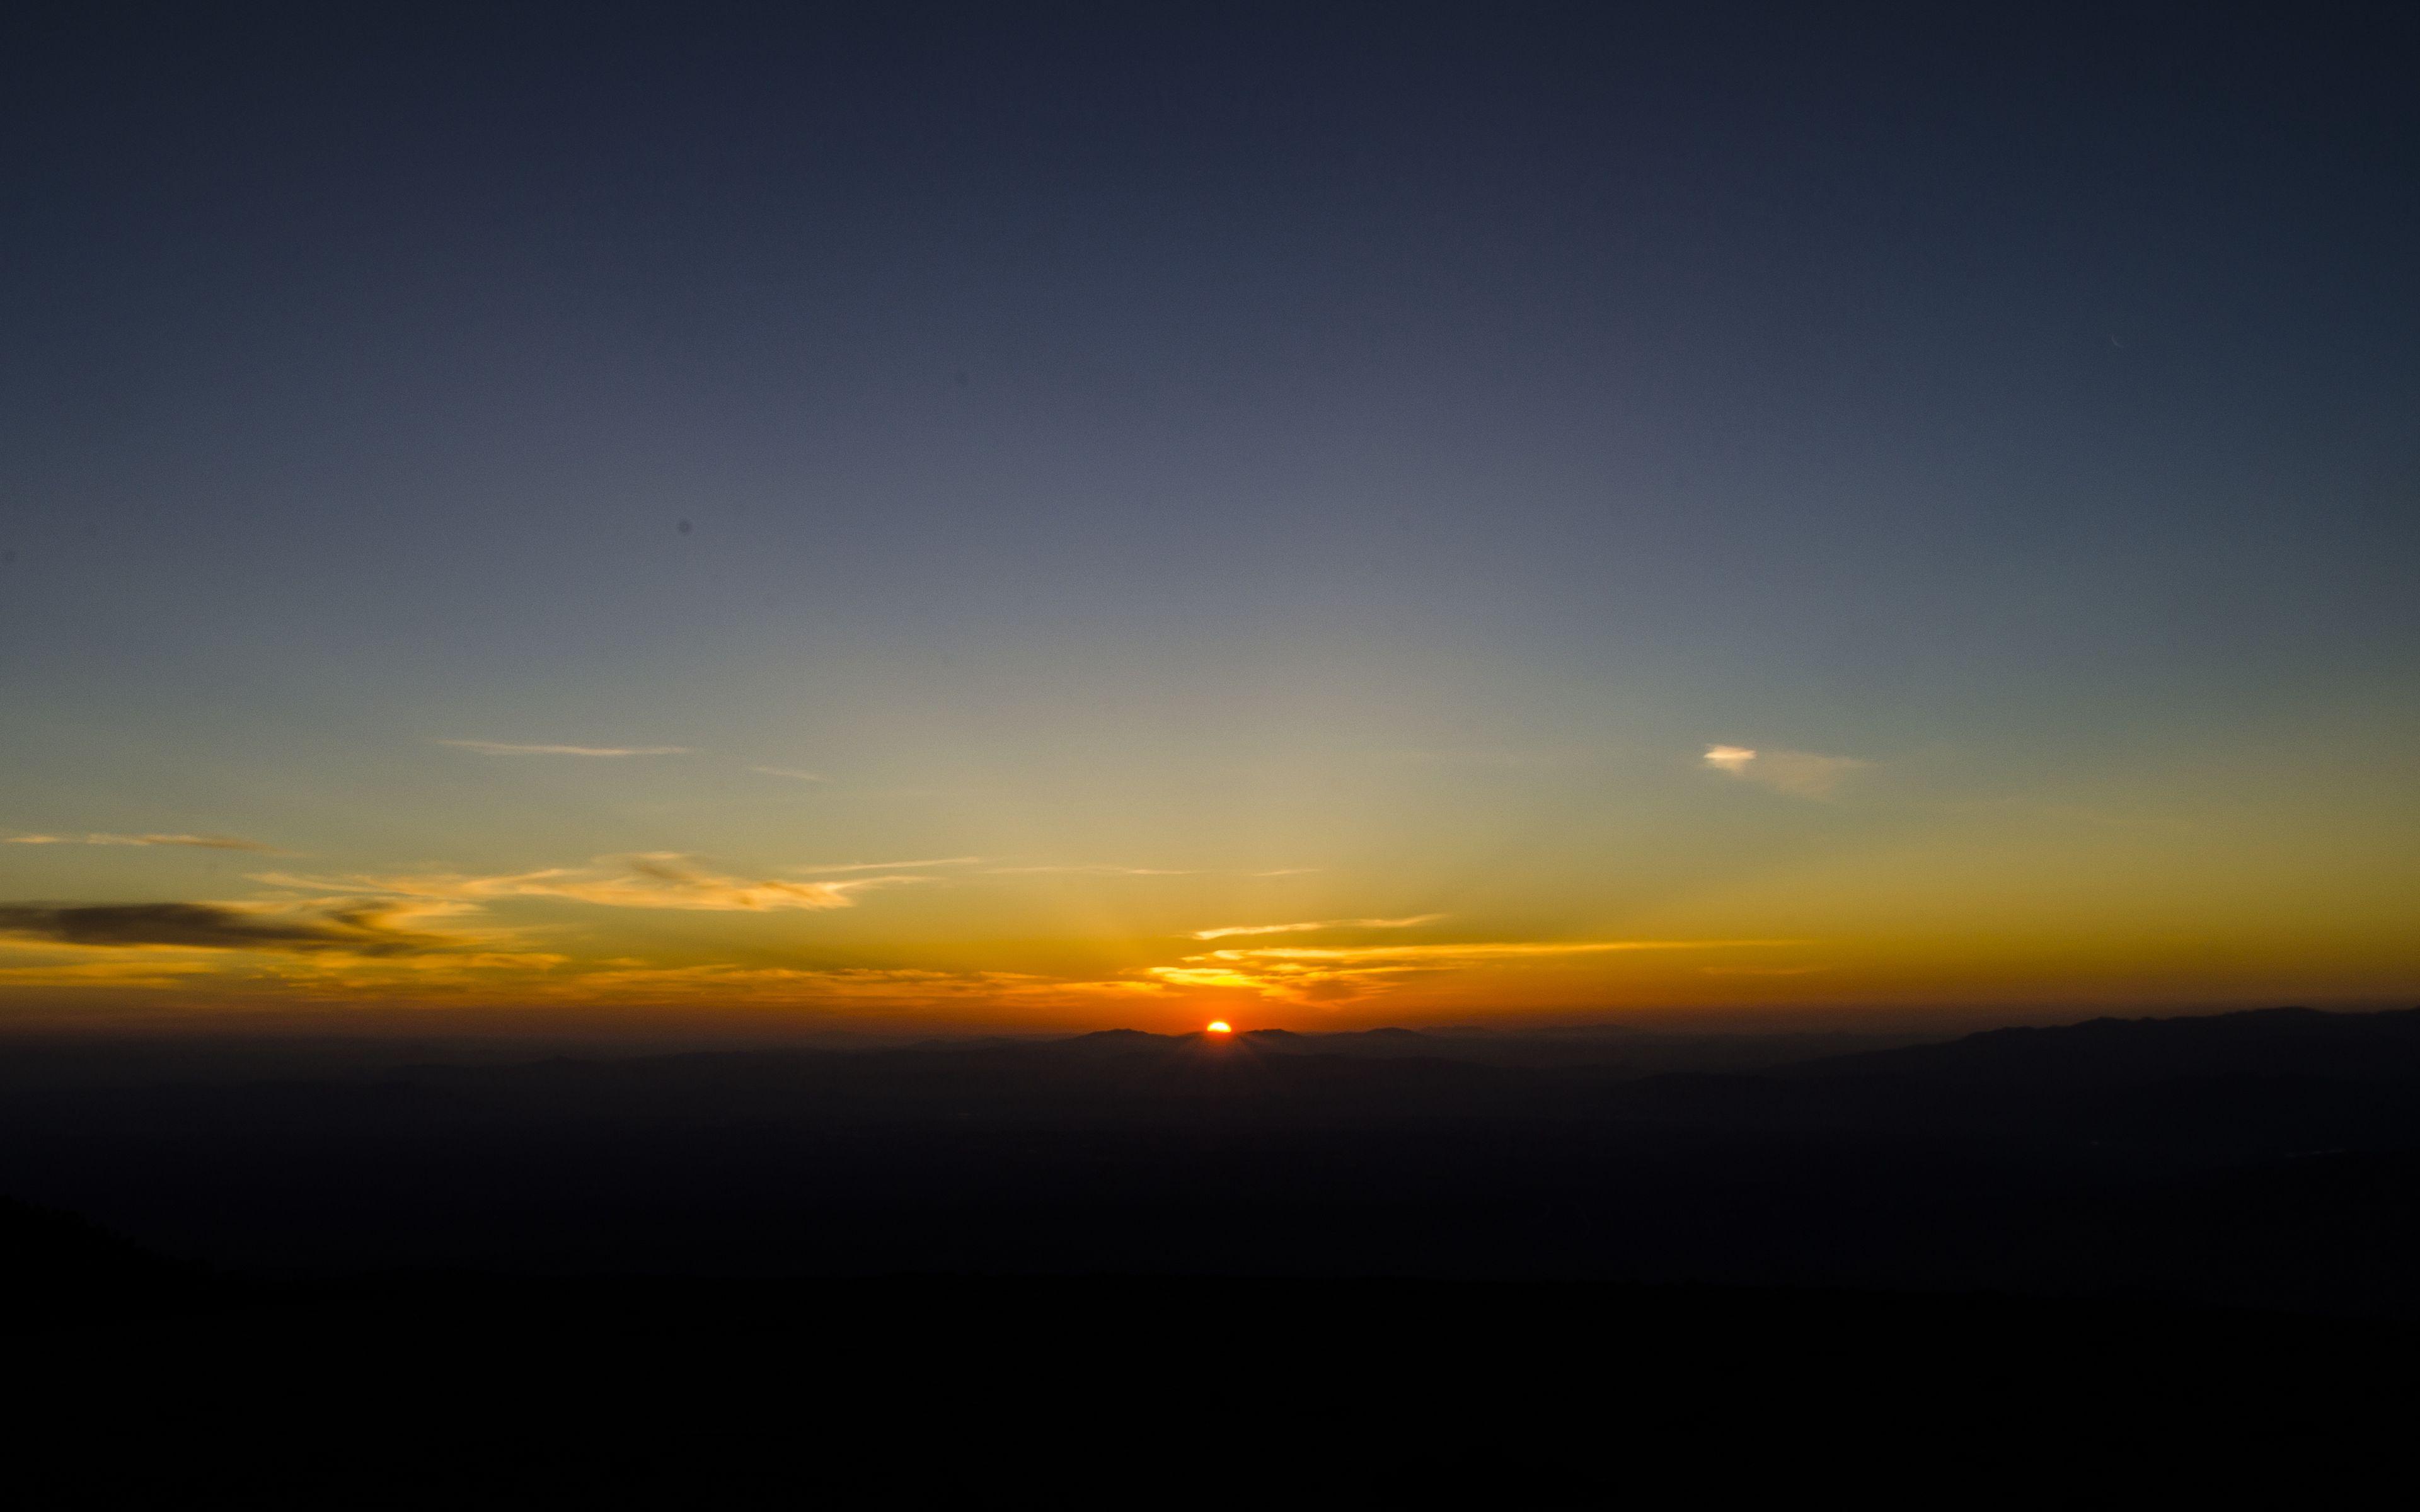 Wallpaper Dawn, Horizon, Mountains, Sun, Sky, Dark, - Red Sky At Morning , HD Wallpaper & Backgrounds